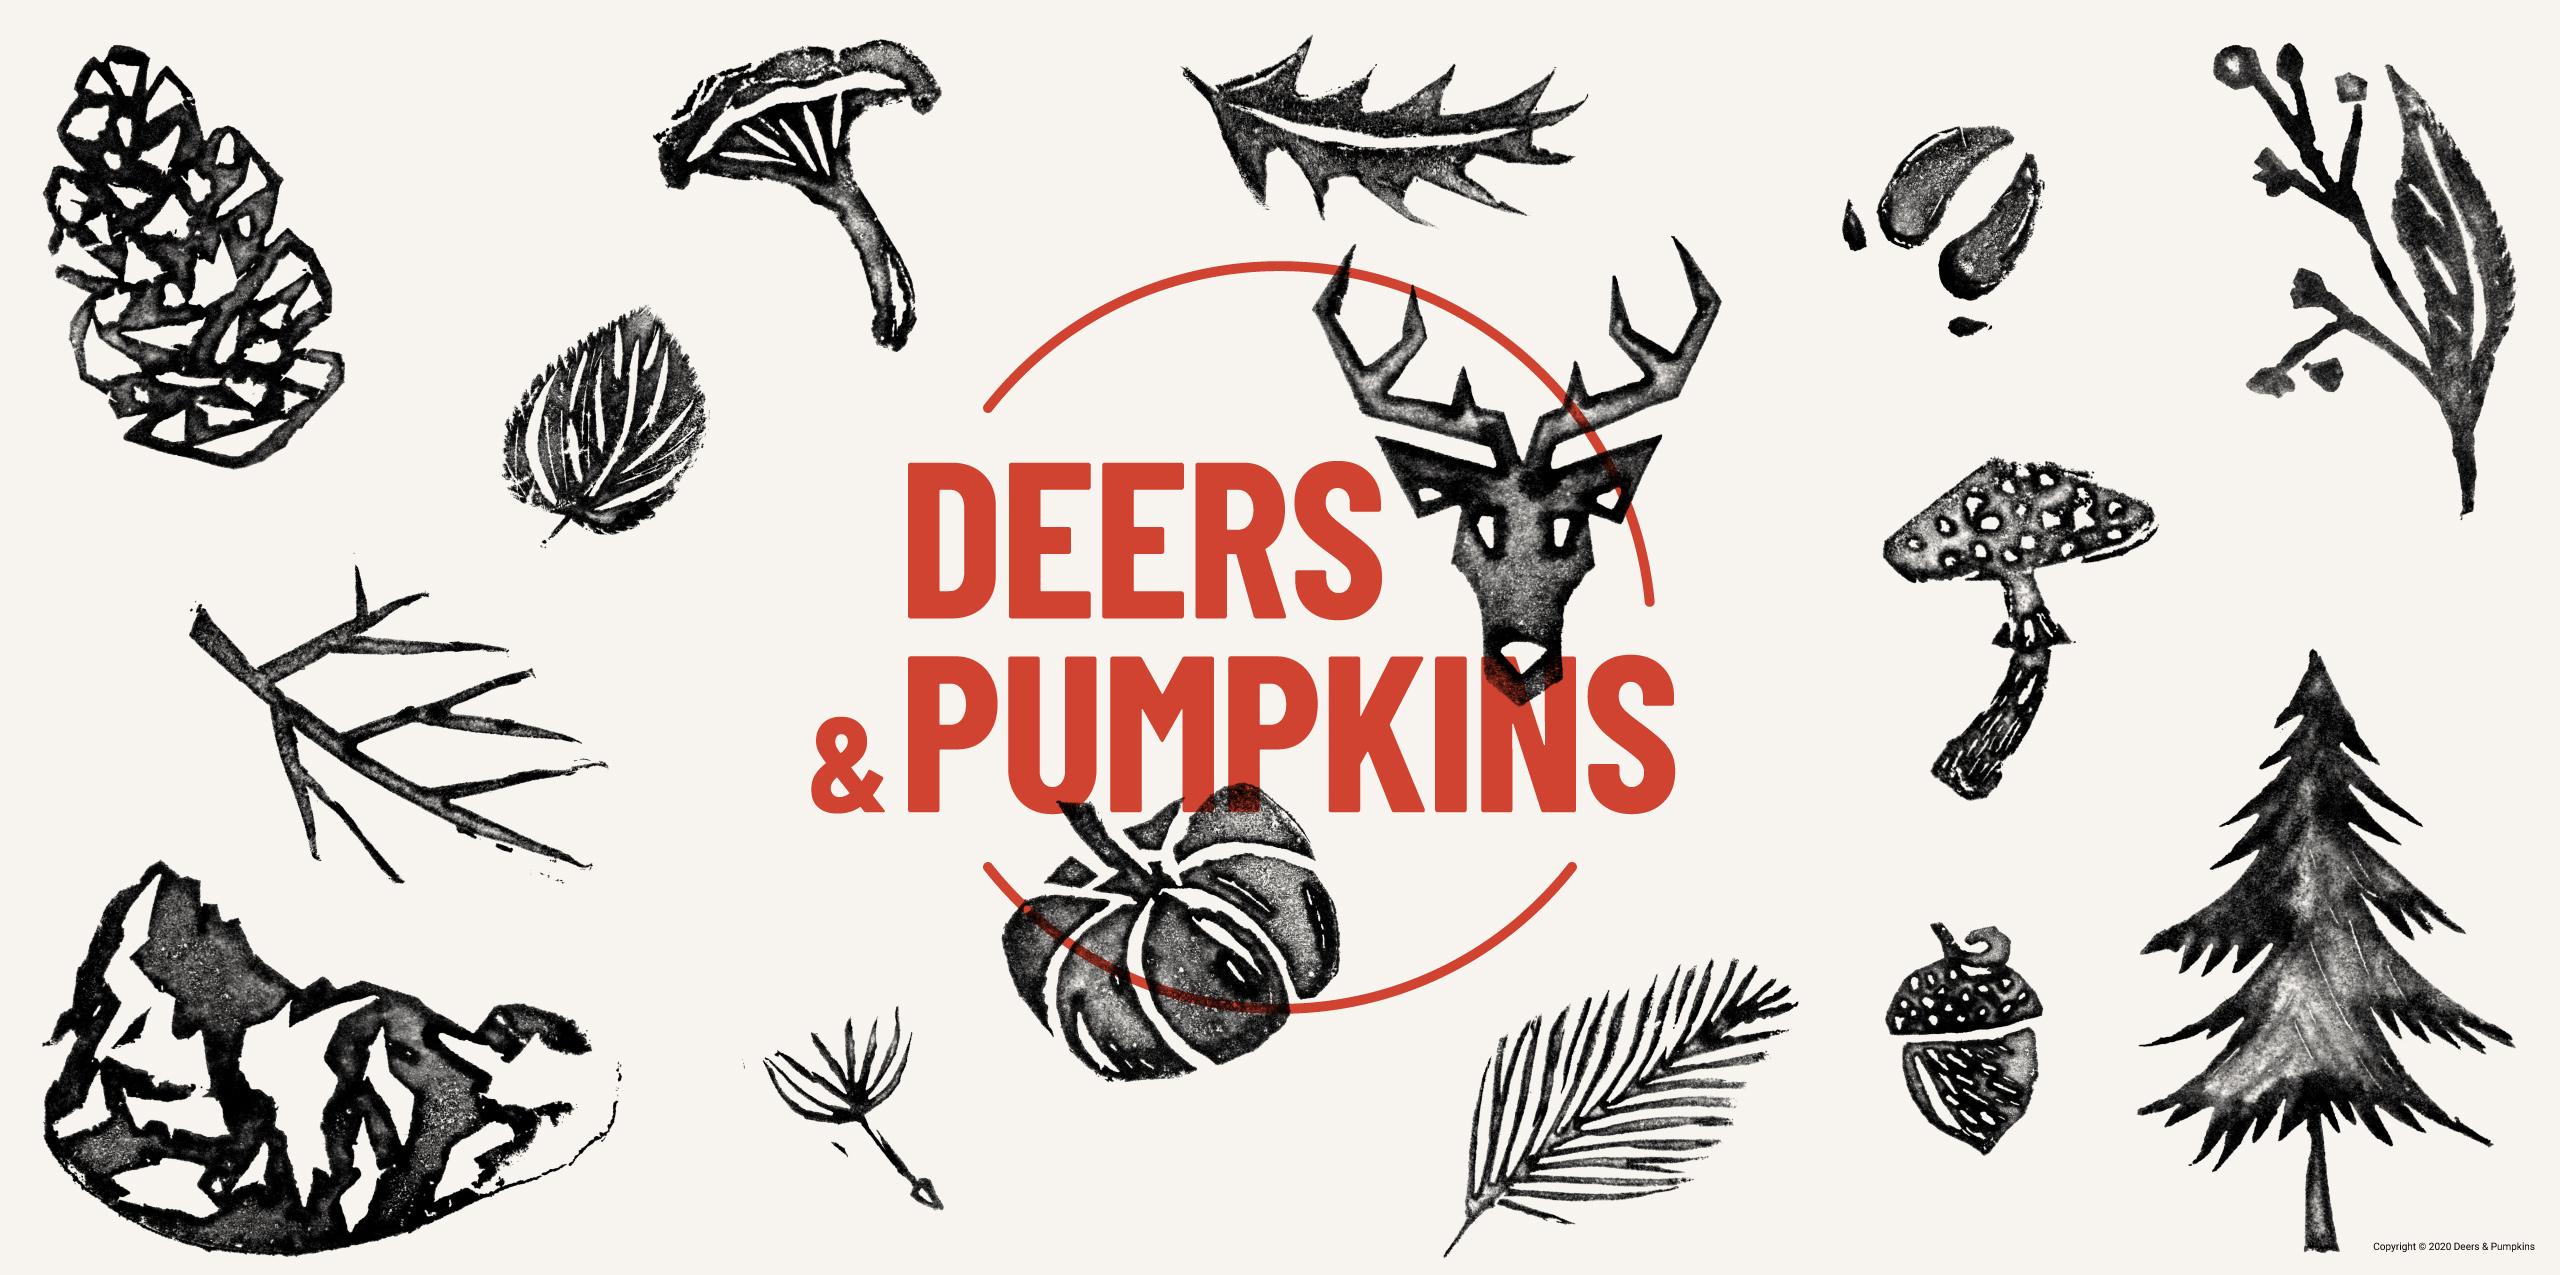 Deers & Pumpkins